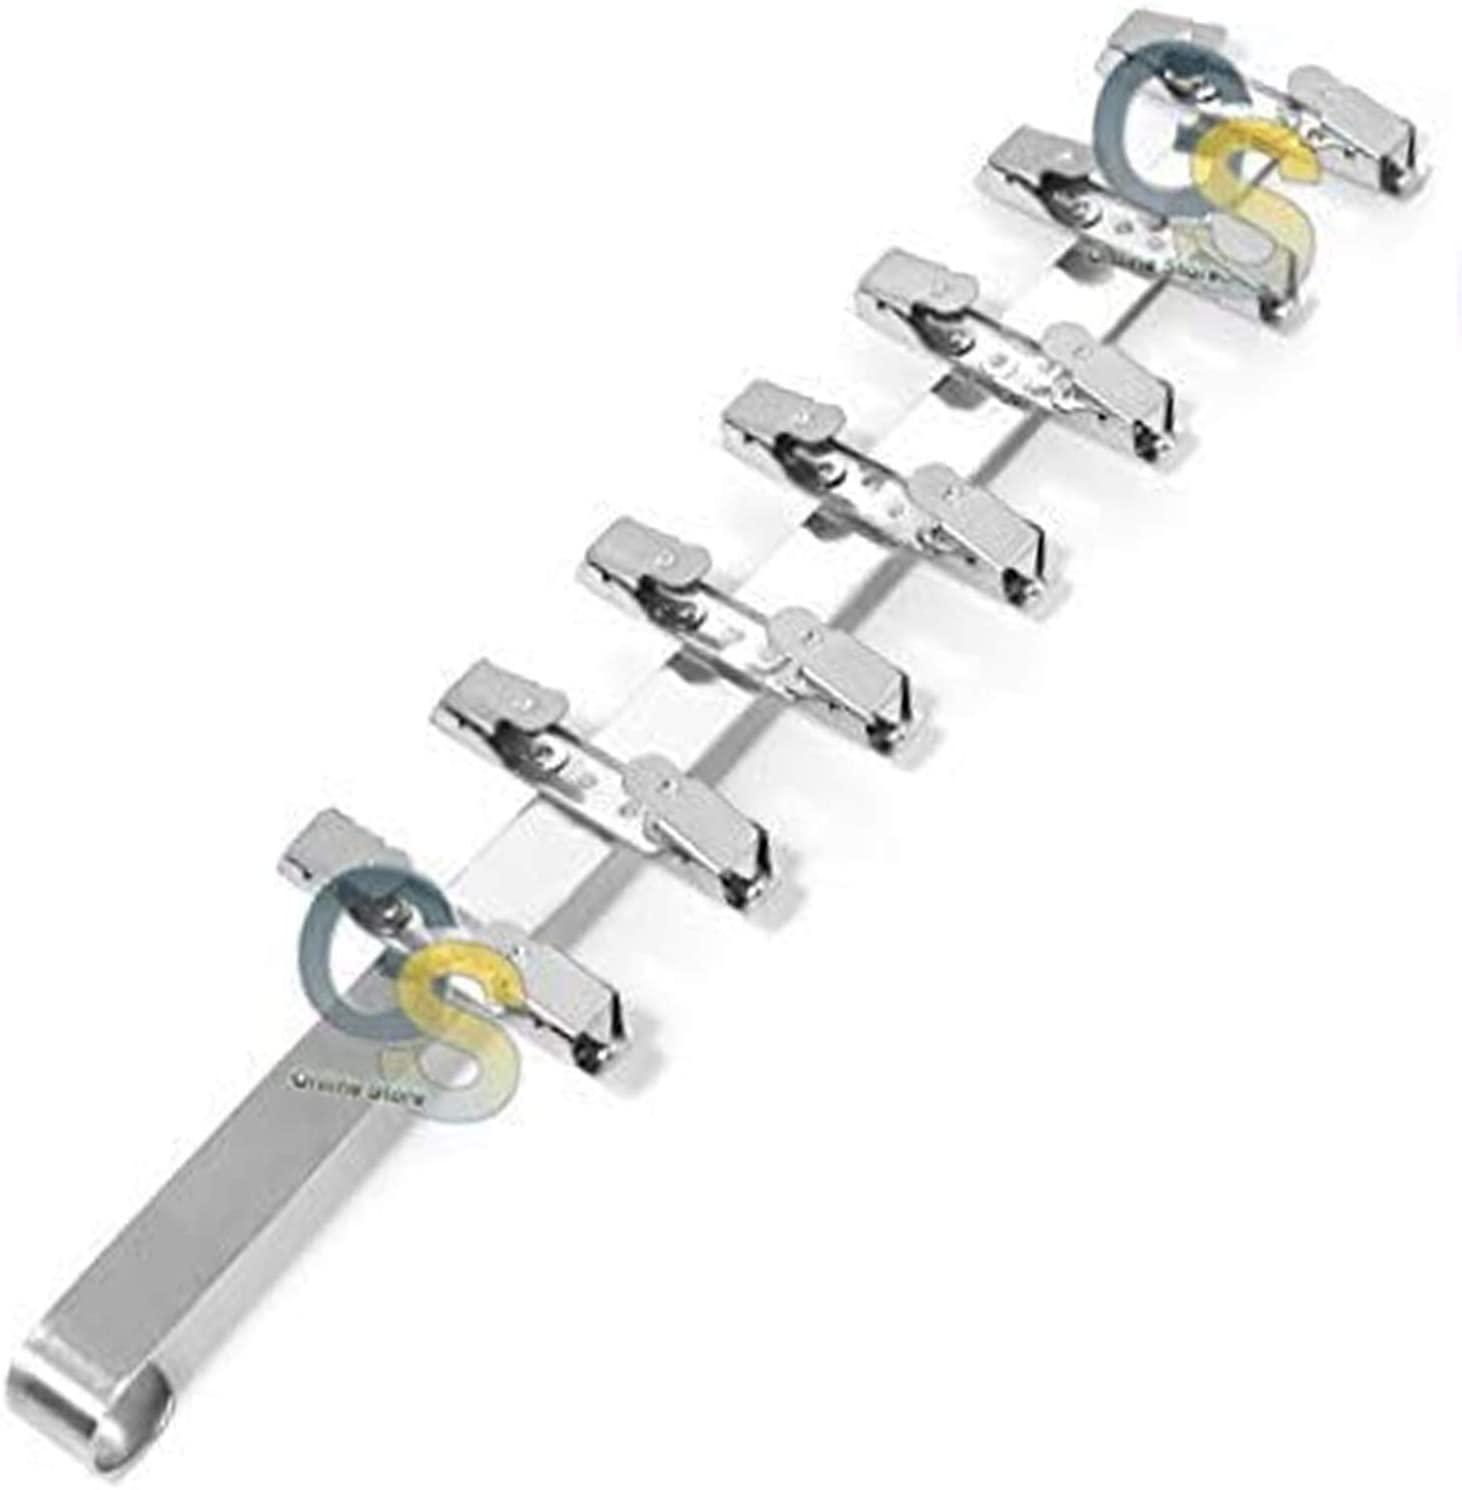 G.S DENTAL X-RAY Film Hanger with 7 Clip (Dental Supply)